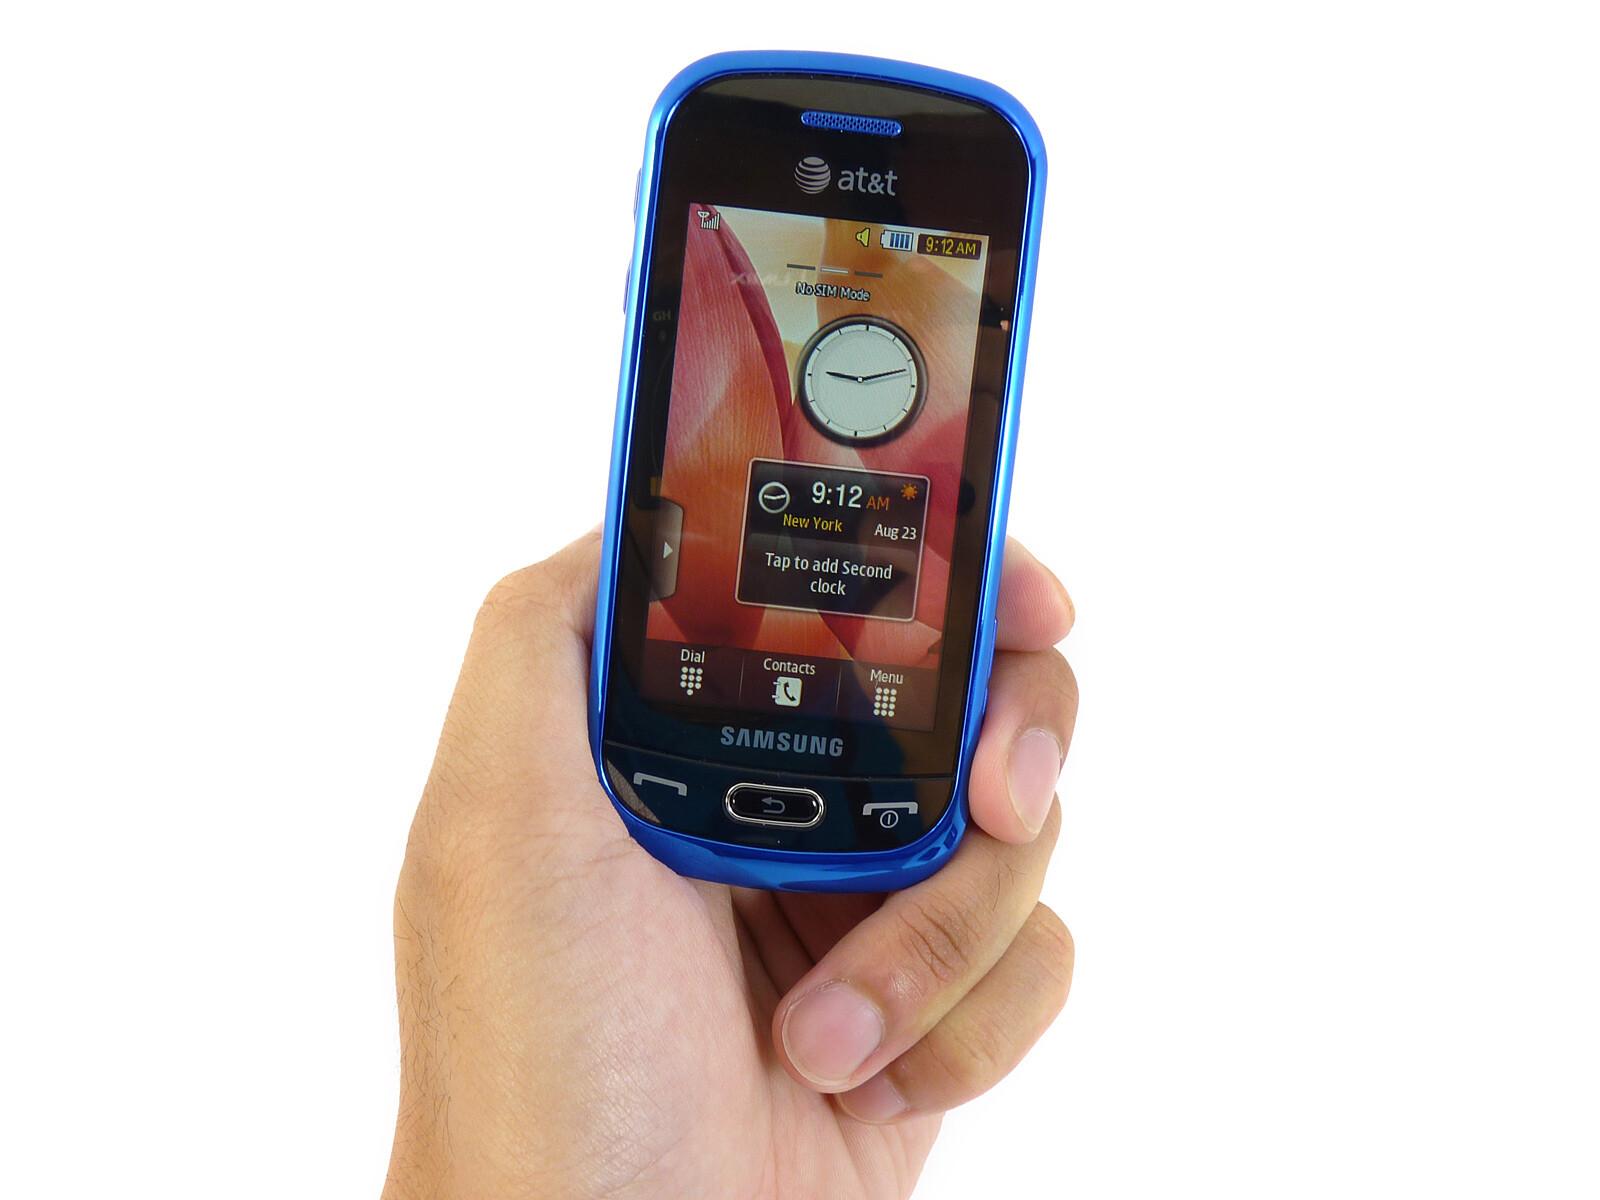 samsung eternity ii photos rh phonearena com Samsung Galaxy S4 Diamond Cases Samsung Eternity A867